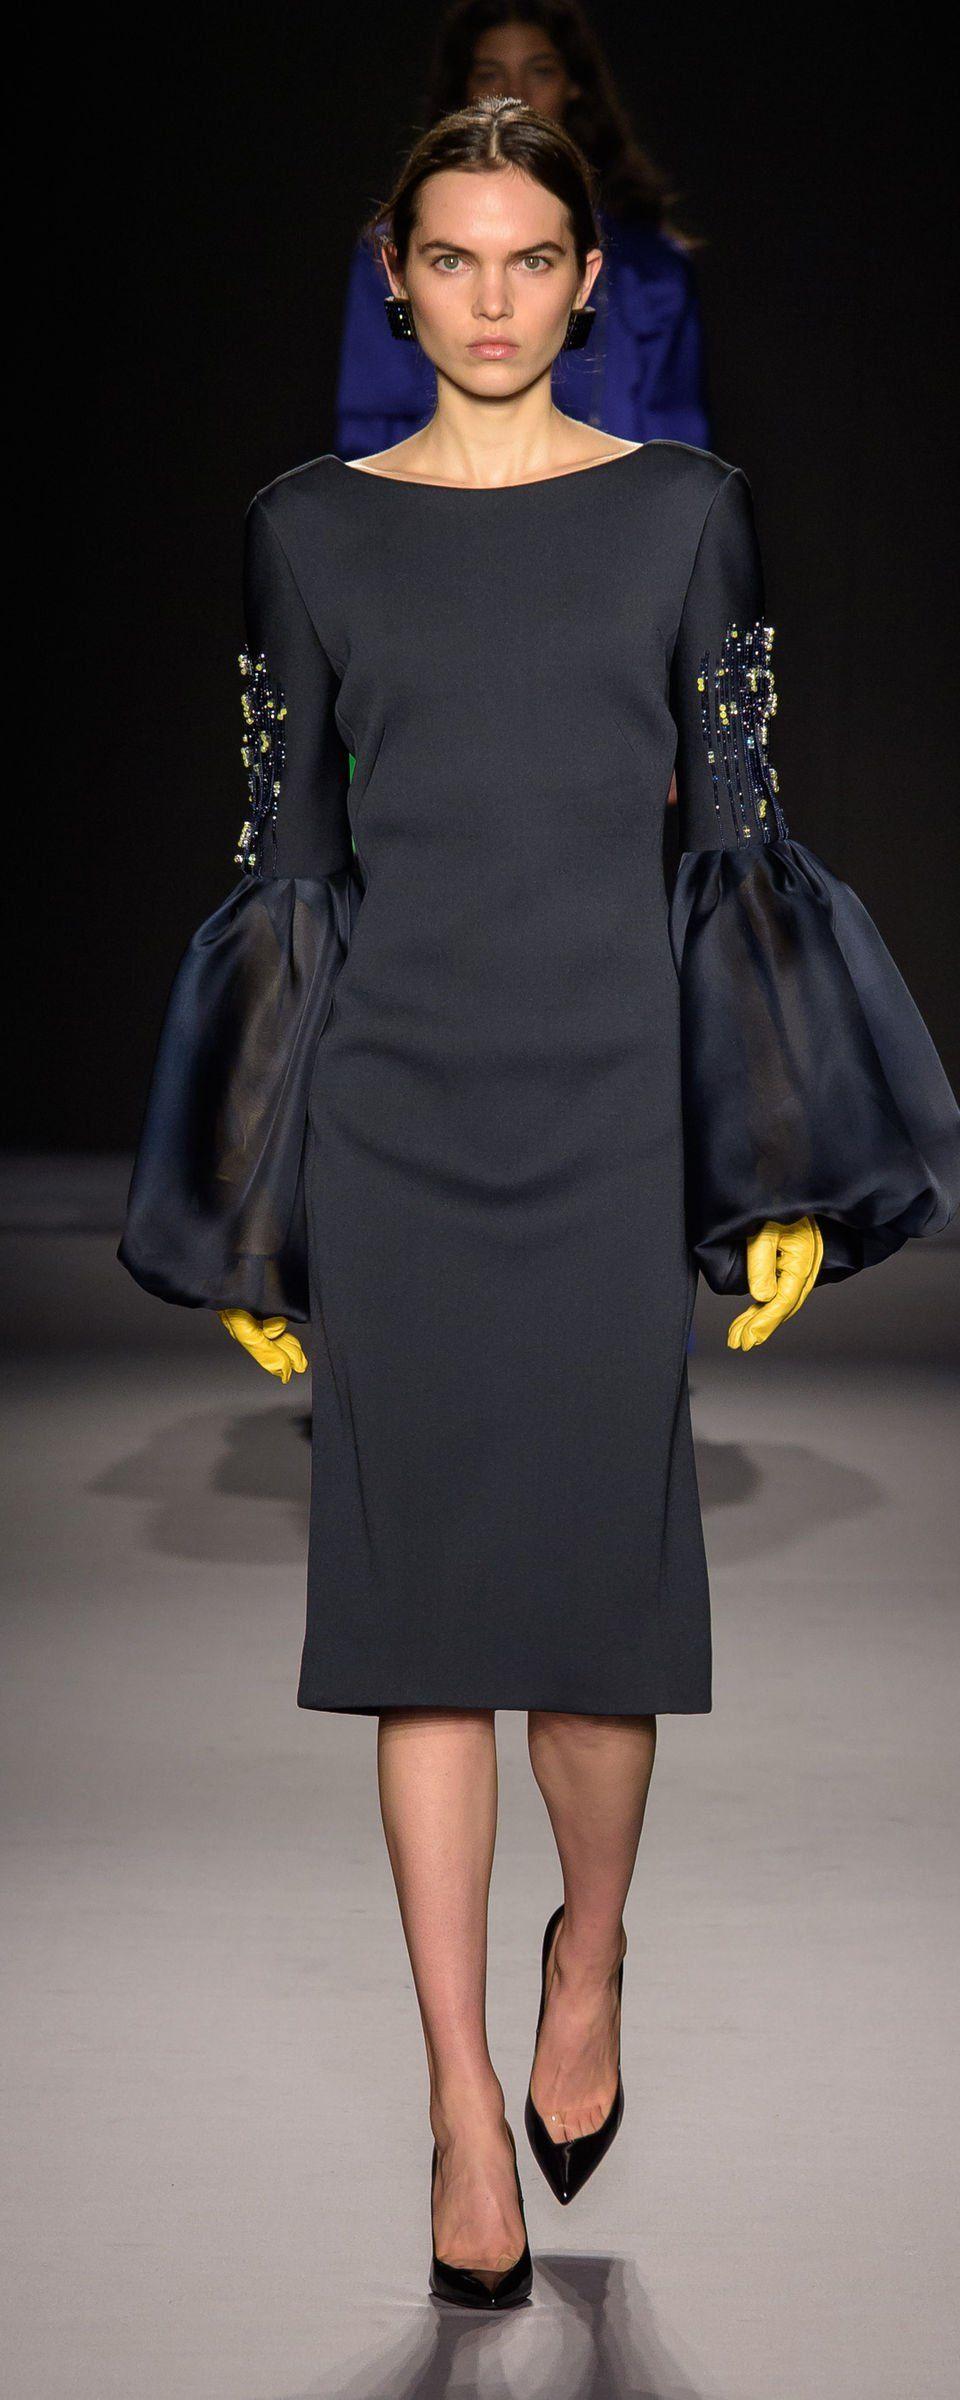 Yeni Trend 2019 Portre Elbiseler